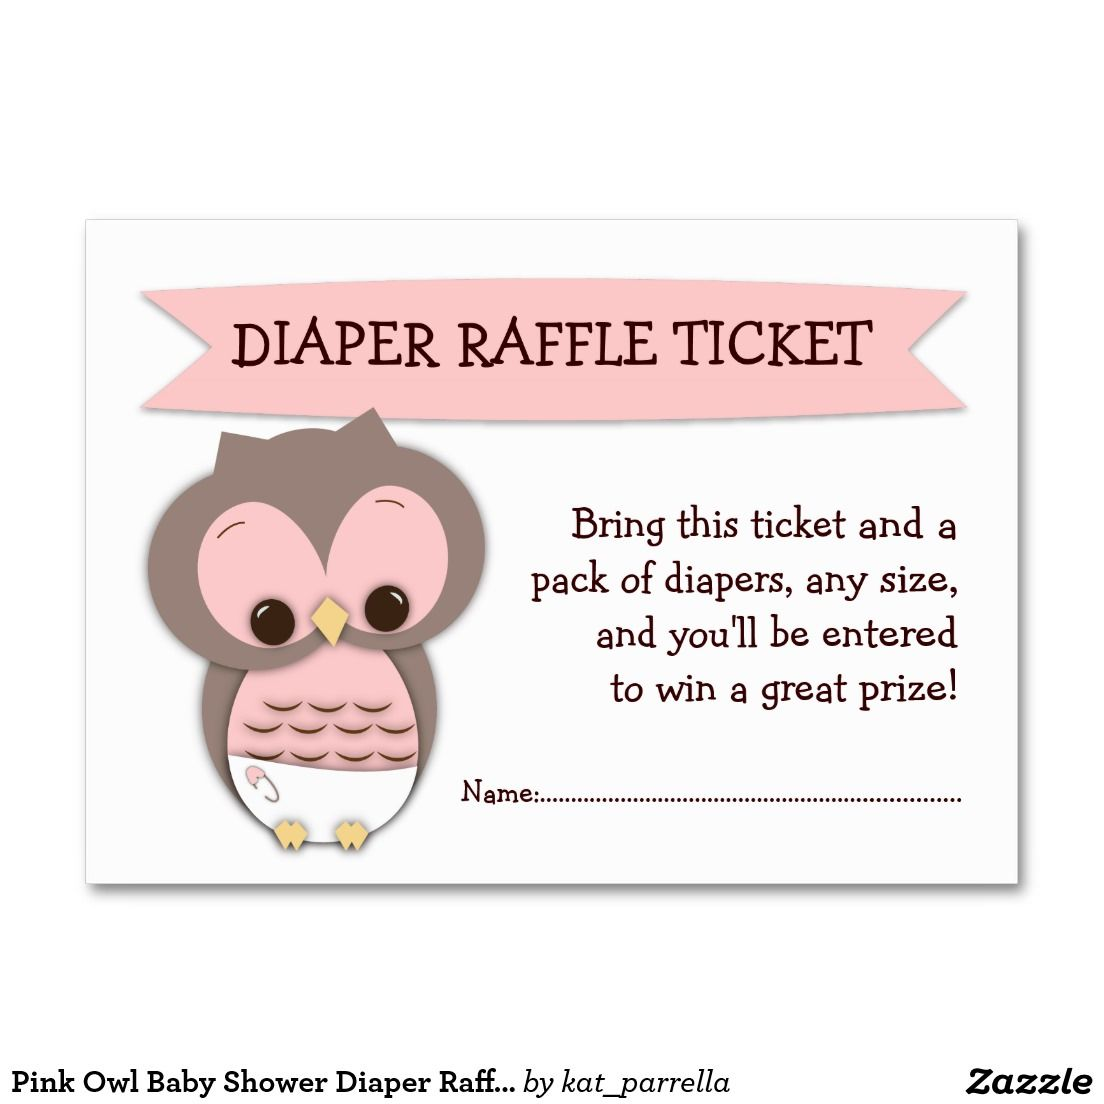 Pink Owl Baby Shower Diaper Raffle Ticket Insert Baby Shower